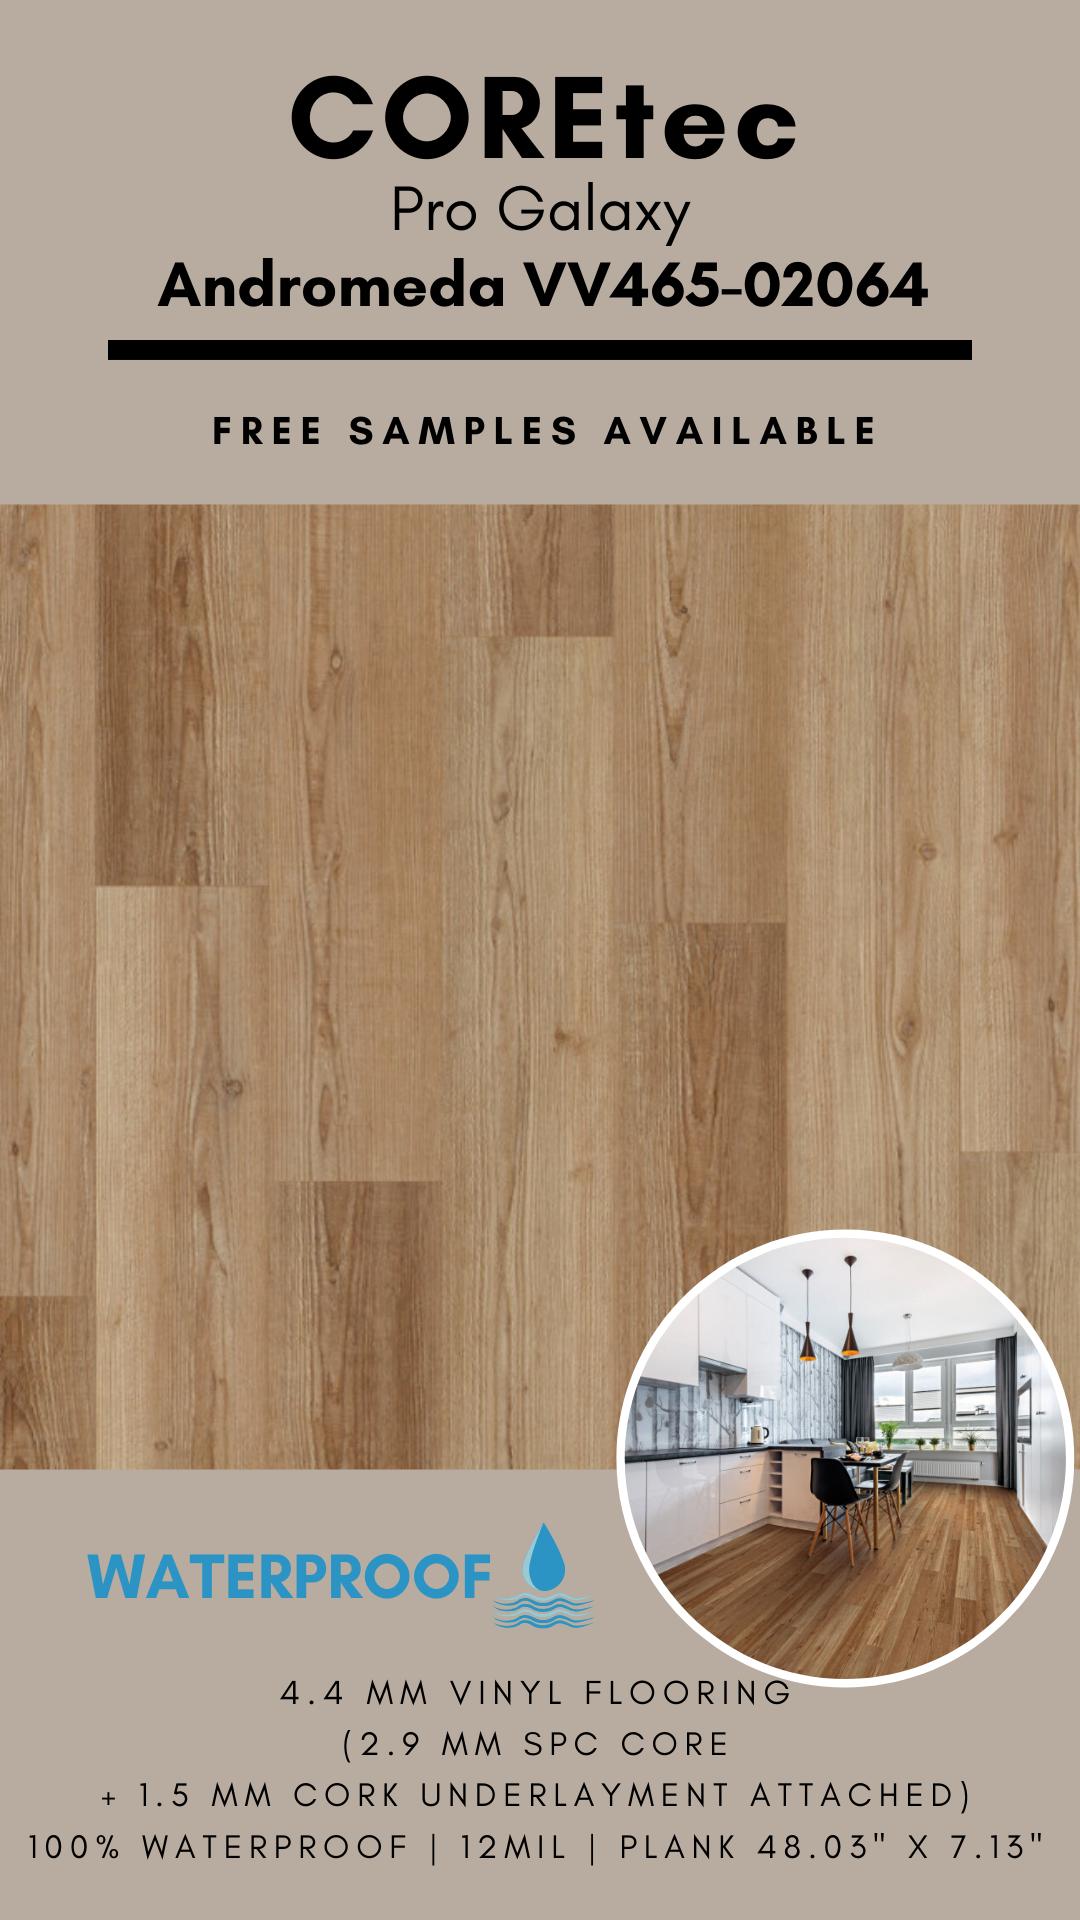 Coretec Pro Galaxy Andromeda Vv465 02064 Spc Vinyl Flooring In 2020 Vinyl Flooring Flooring Cork Underlayment